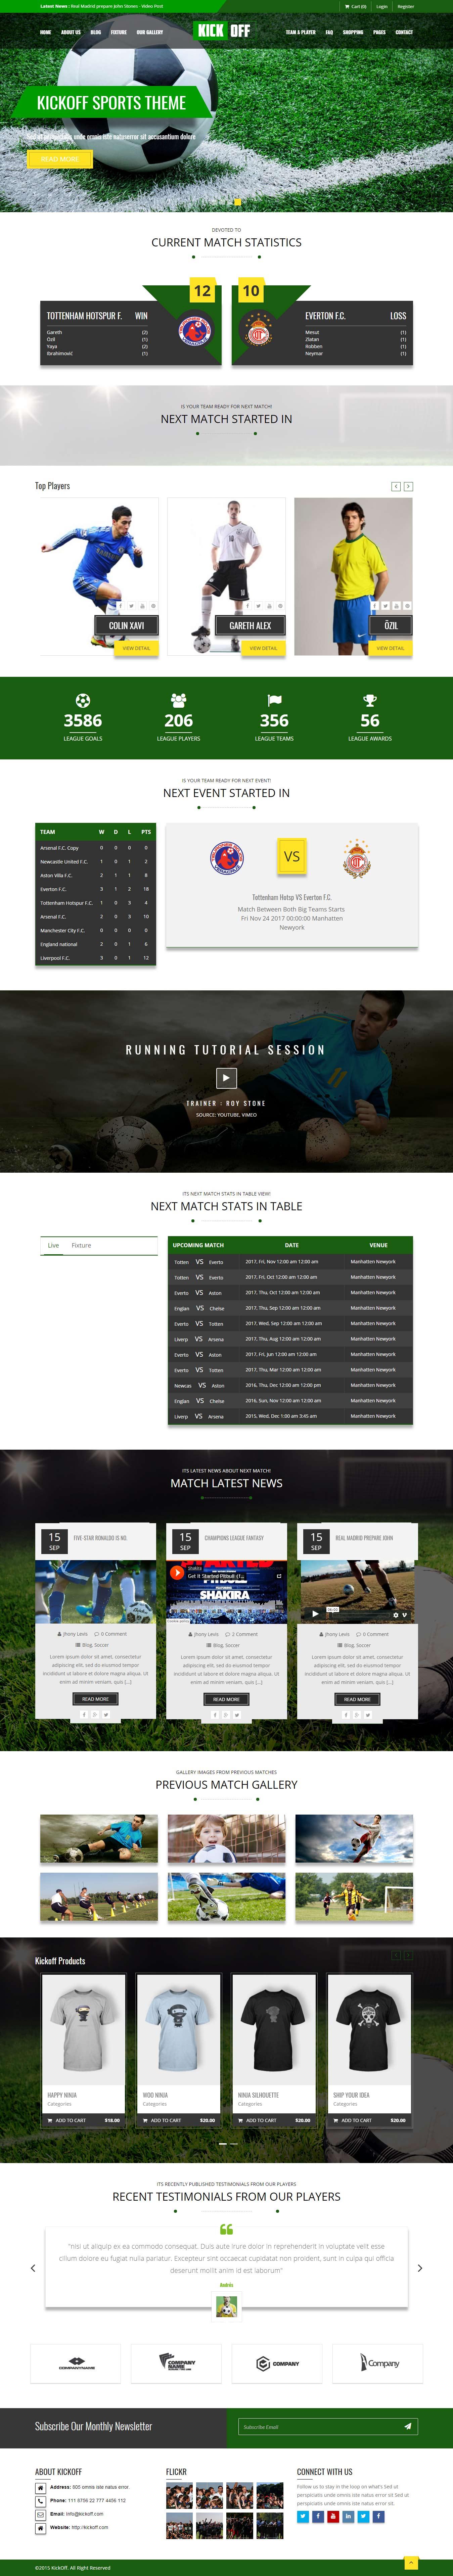 KickOff - Best Premium Sports WordPress Theme